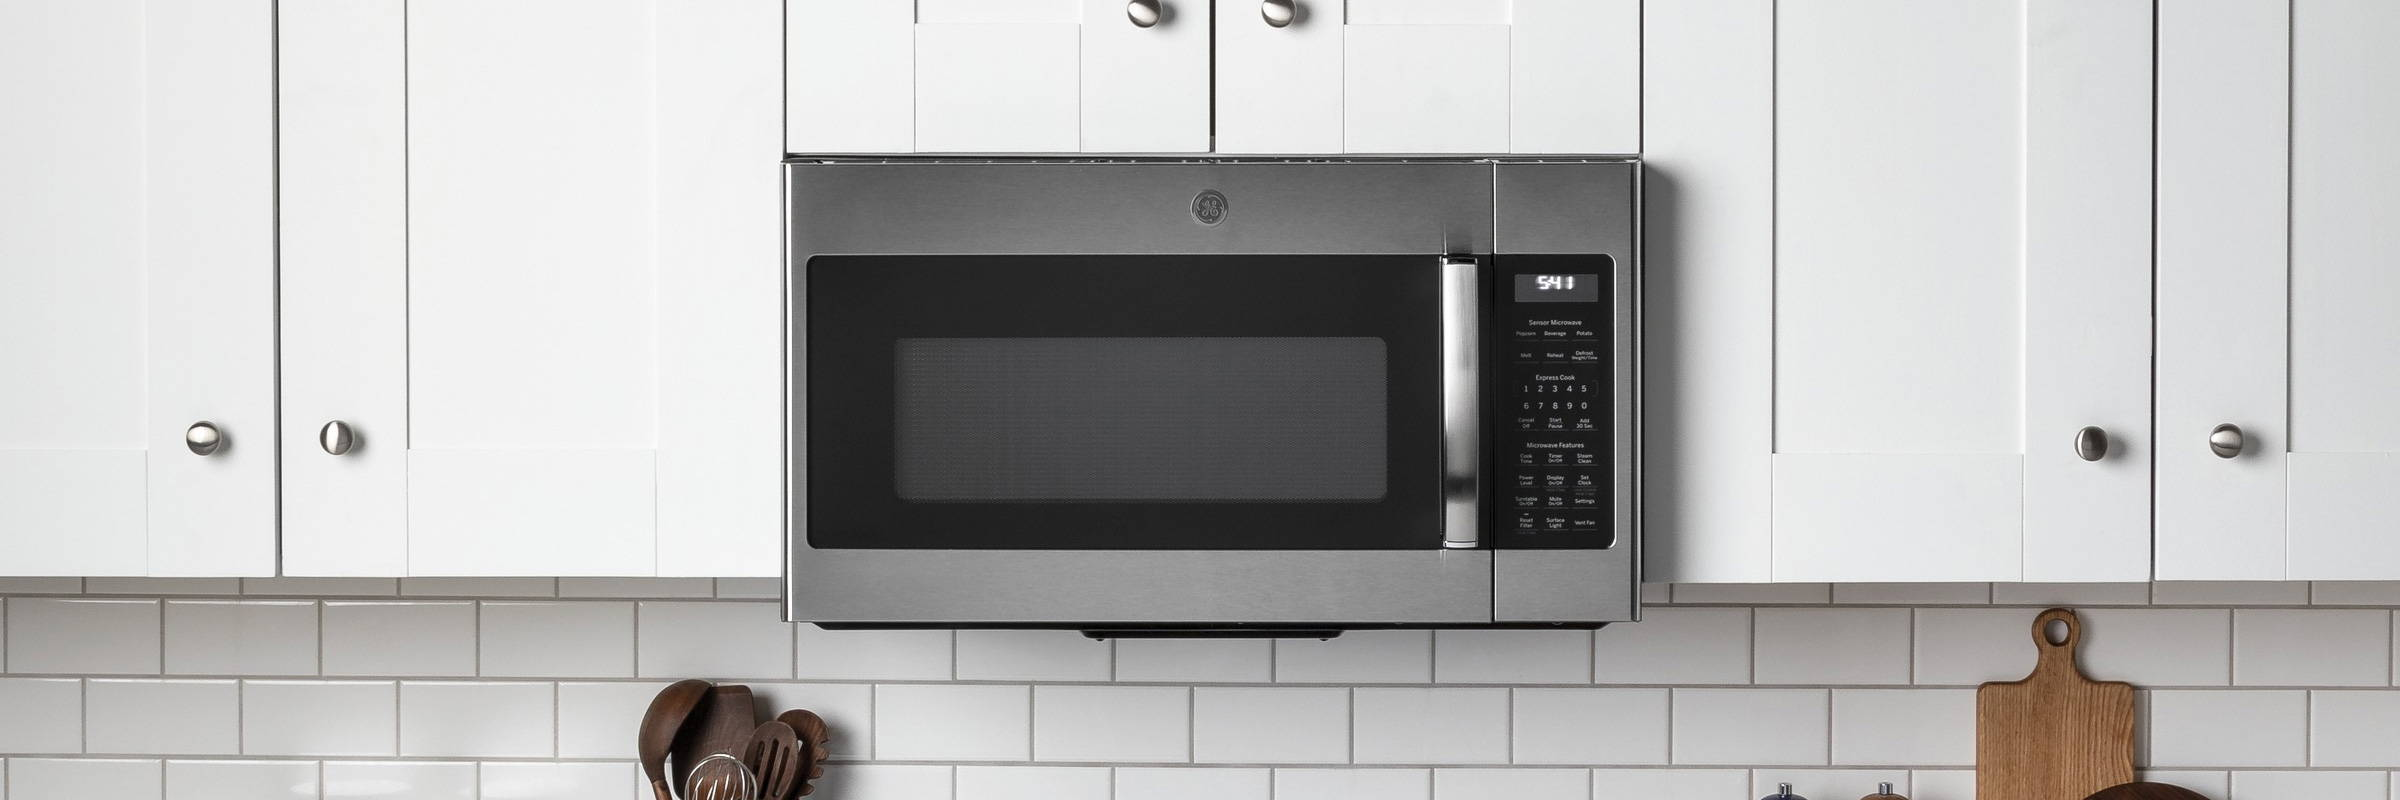 Ge Dual Wave Iii Microwave Oven Manualbestmicrowave